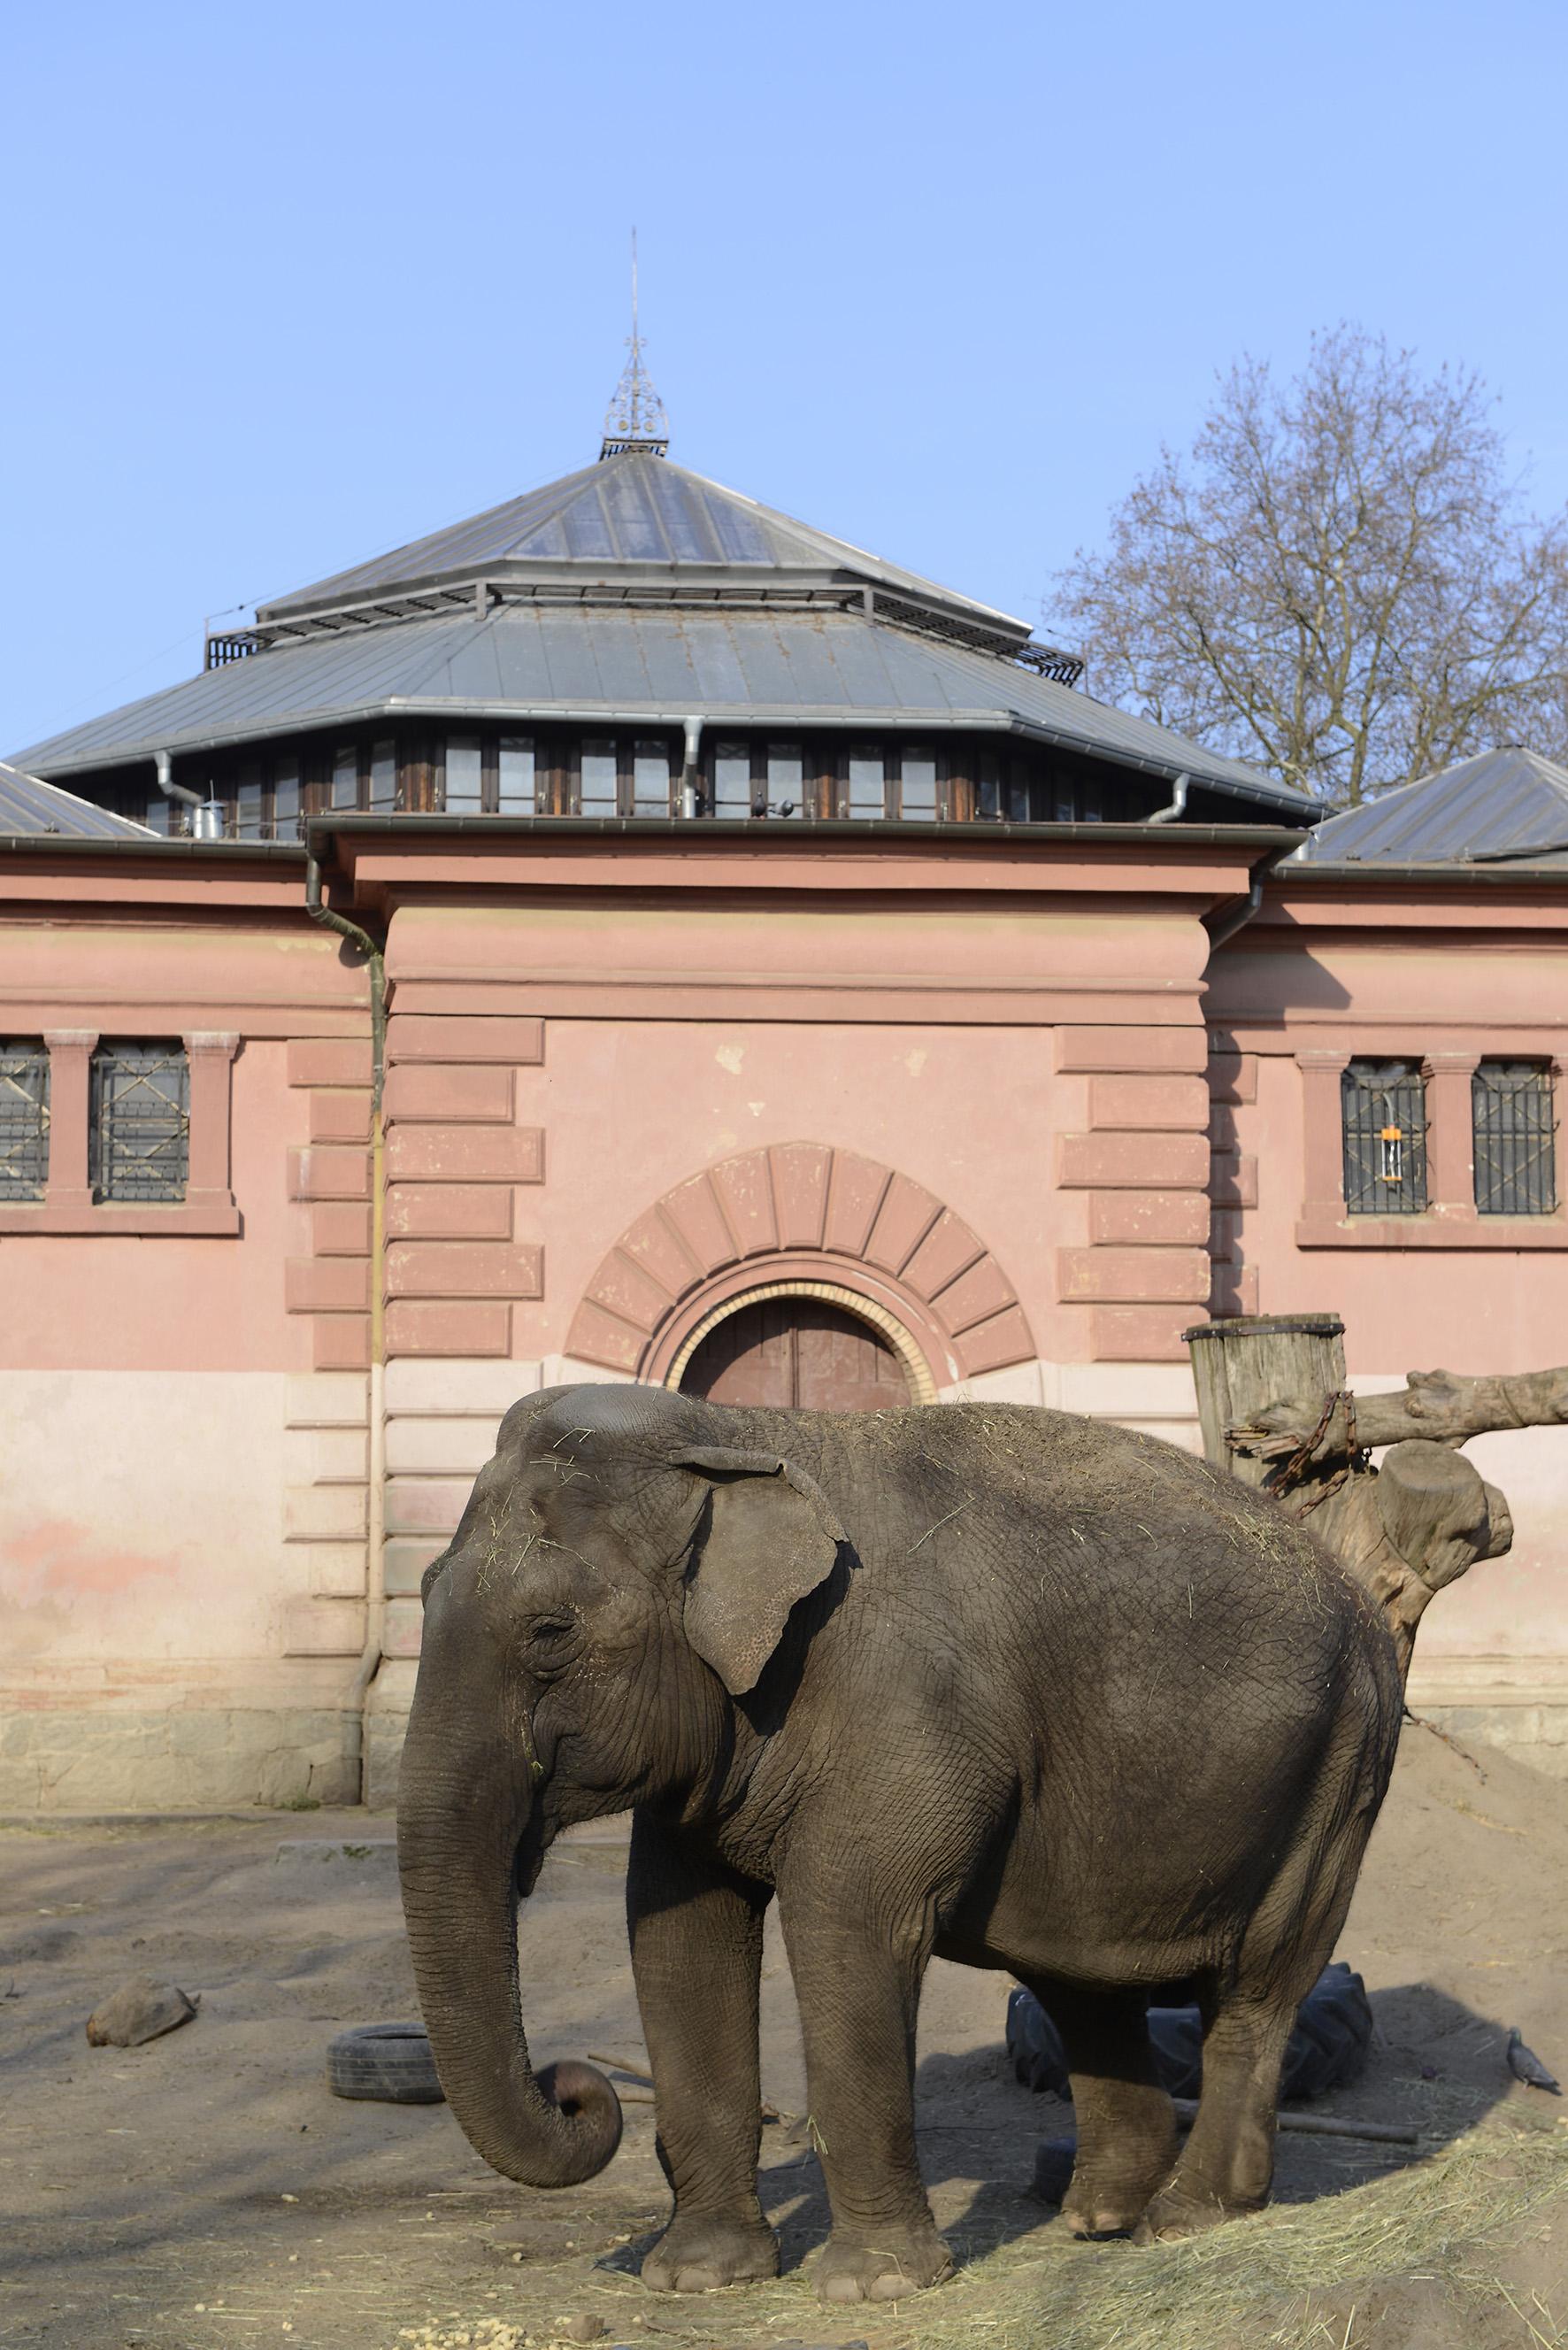 Olifanten in dierentuin van Warschau krijgt cannabis